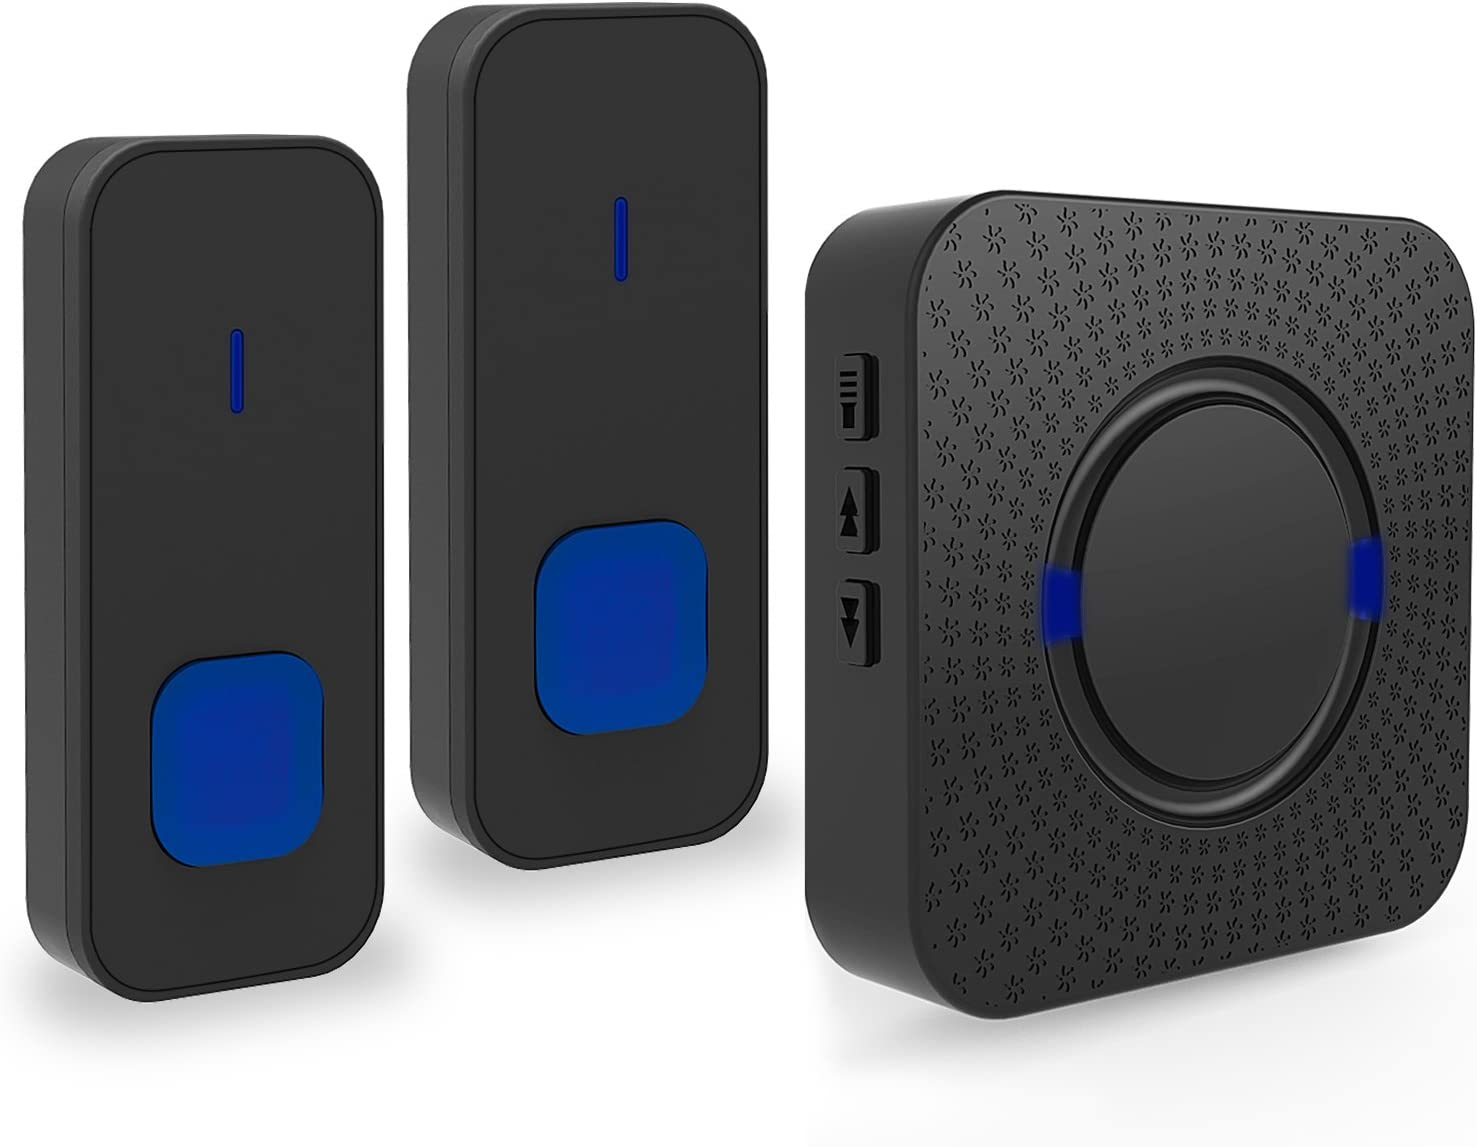 Timbre de puerta lanvy WiFi inalámbrico timbre resistente al agua radio EXTERIOR un receptor y dos emisor 55timbre de melodías–Negro